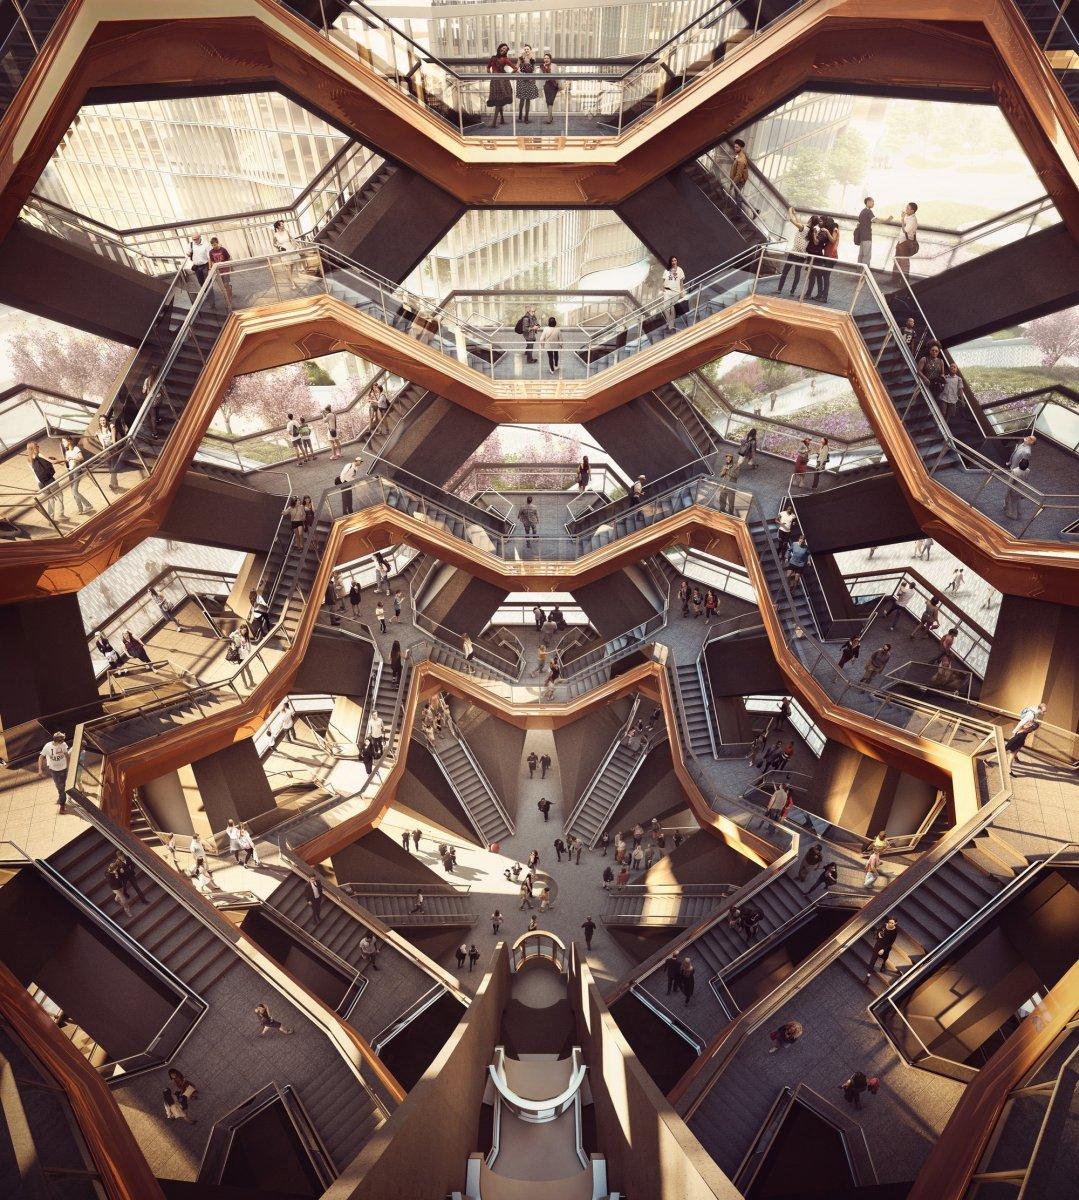 Interior_View_of_the_Vessel_-_courtesy_of_Forbes_Massie-Heatherwick_Studio.jpg